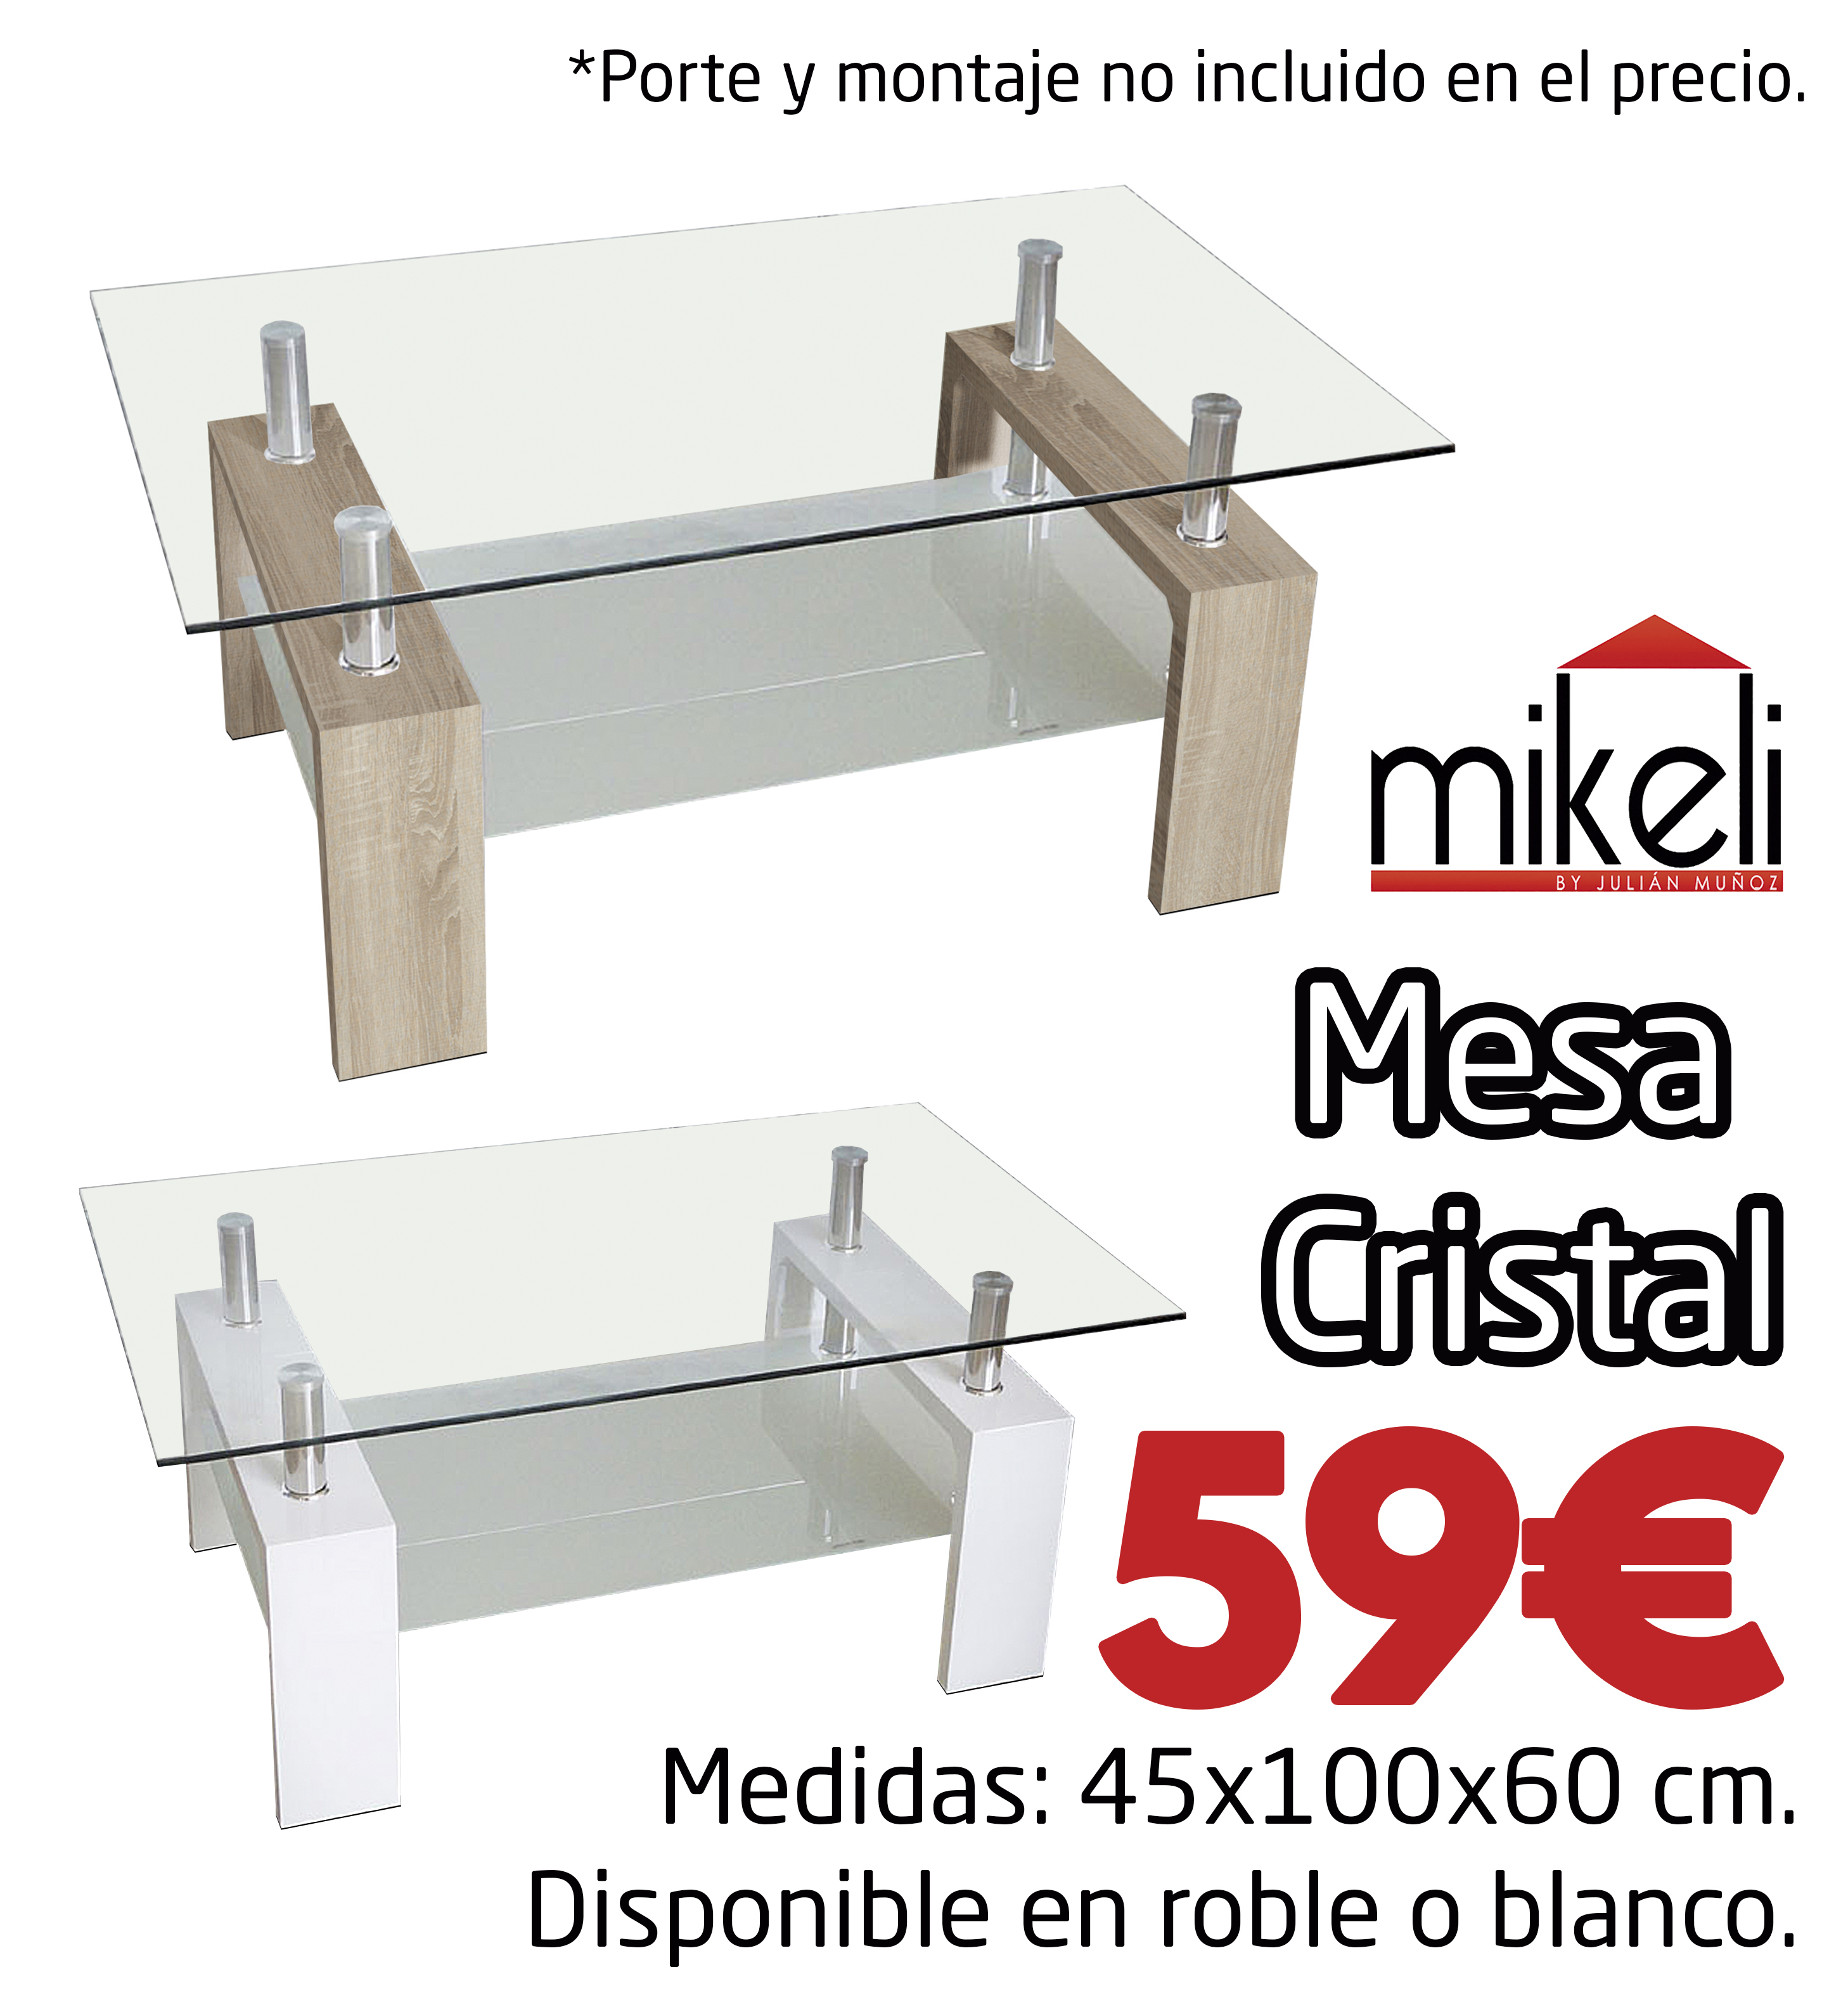 Muebles Gilabert - Mesa Cristal Centro Gilabert Mikeli Tu Tienda De Muebles A [mjhdah]https://mueblesmikeli.files.wordpress.com/2015/09/armarios-gilabert-maderda-maciza1.jpg